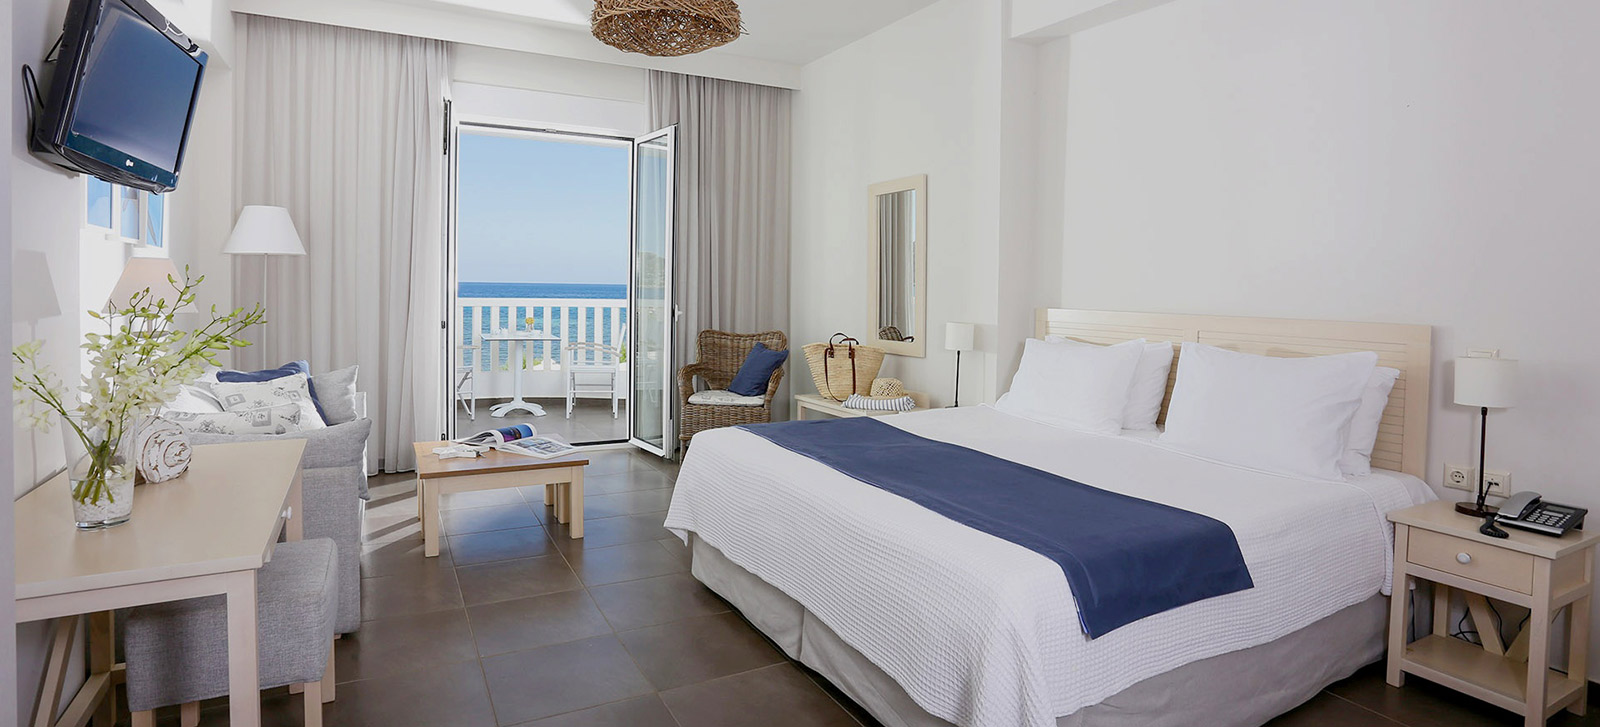 Artina Nuovo Hotel